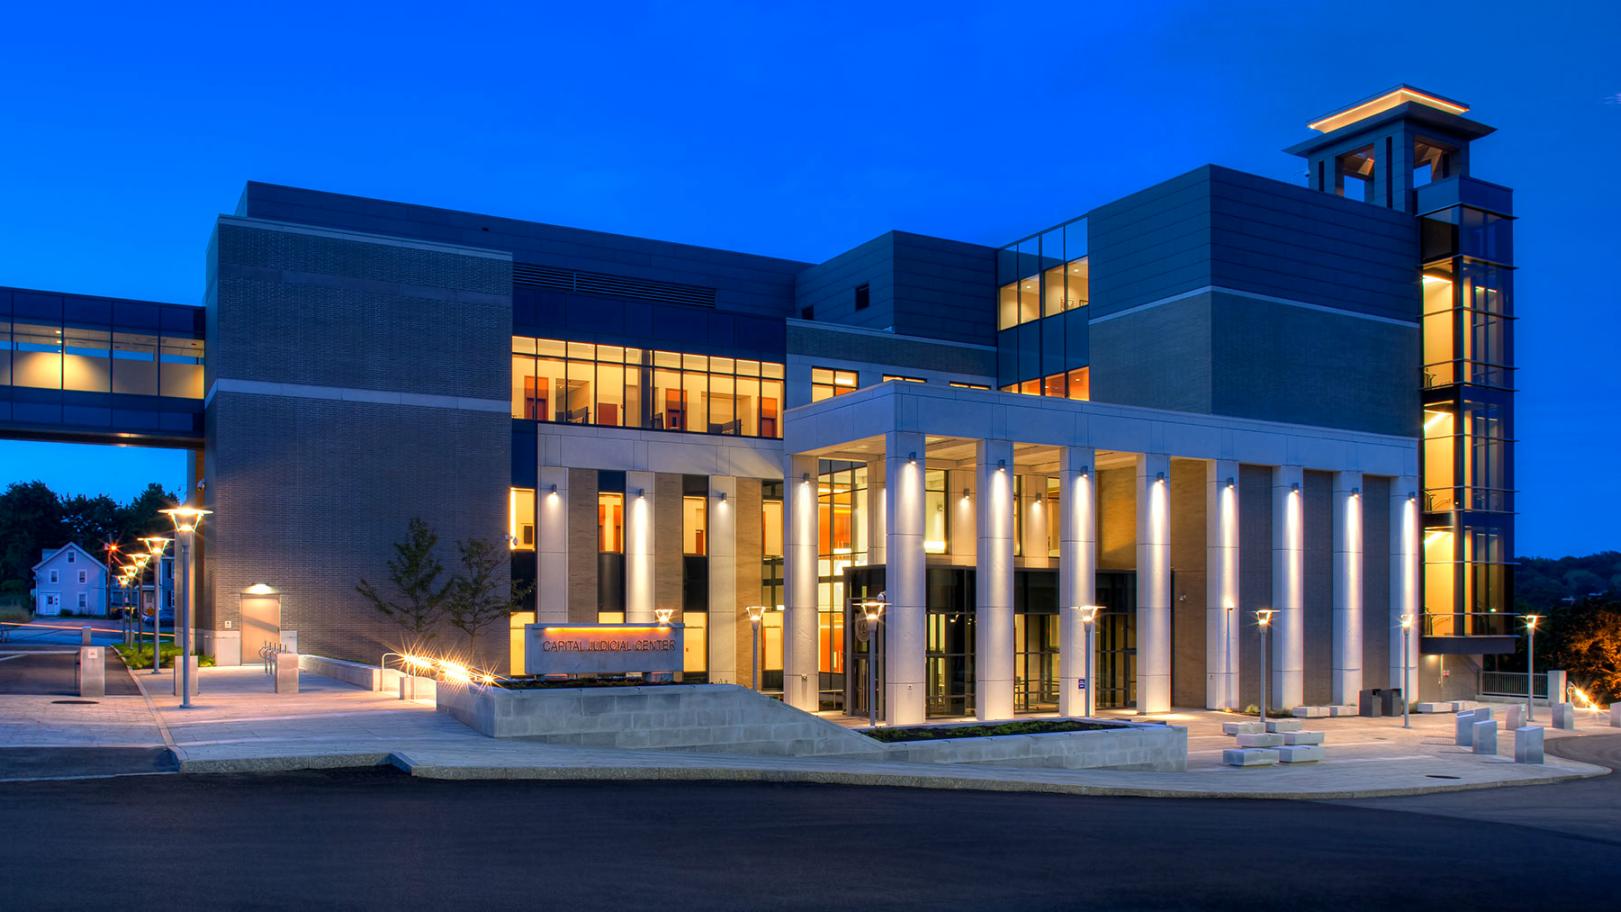 Capital Judicial Center